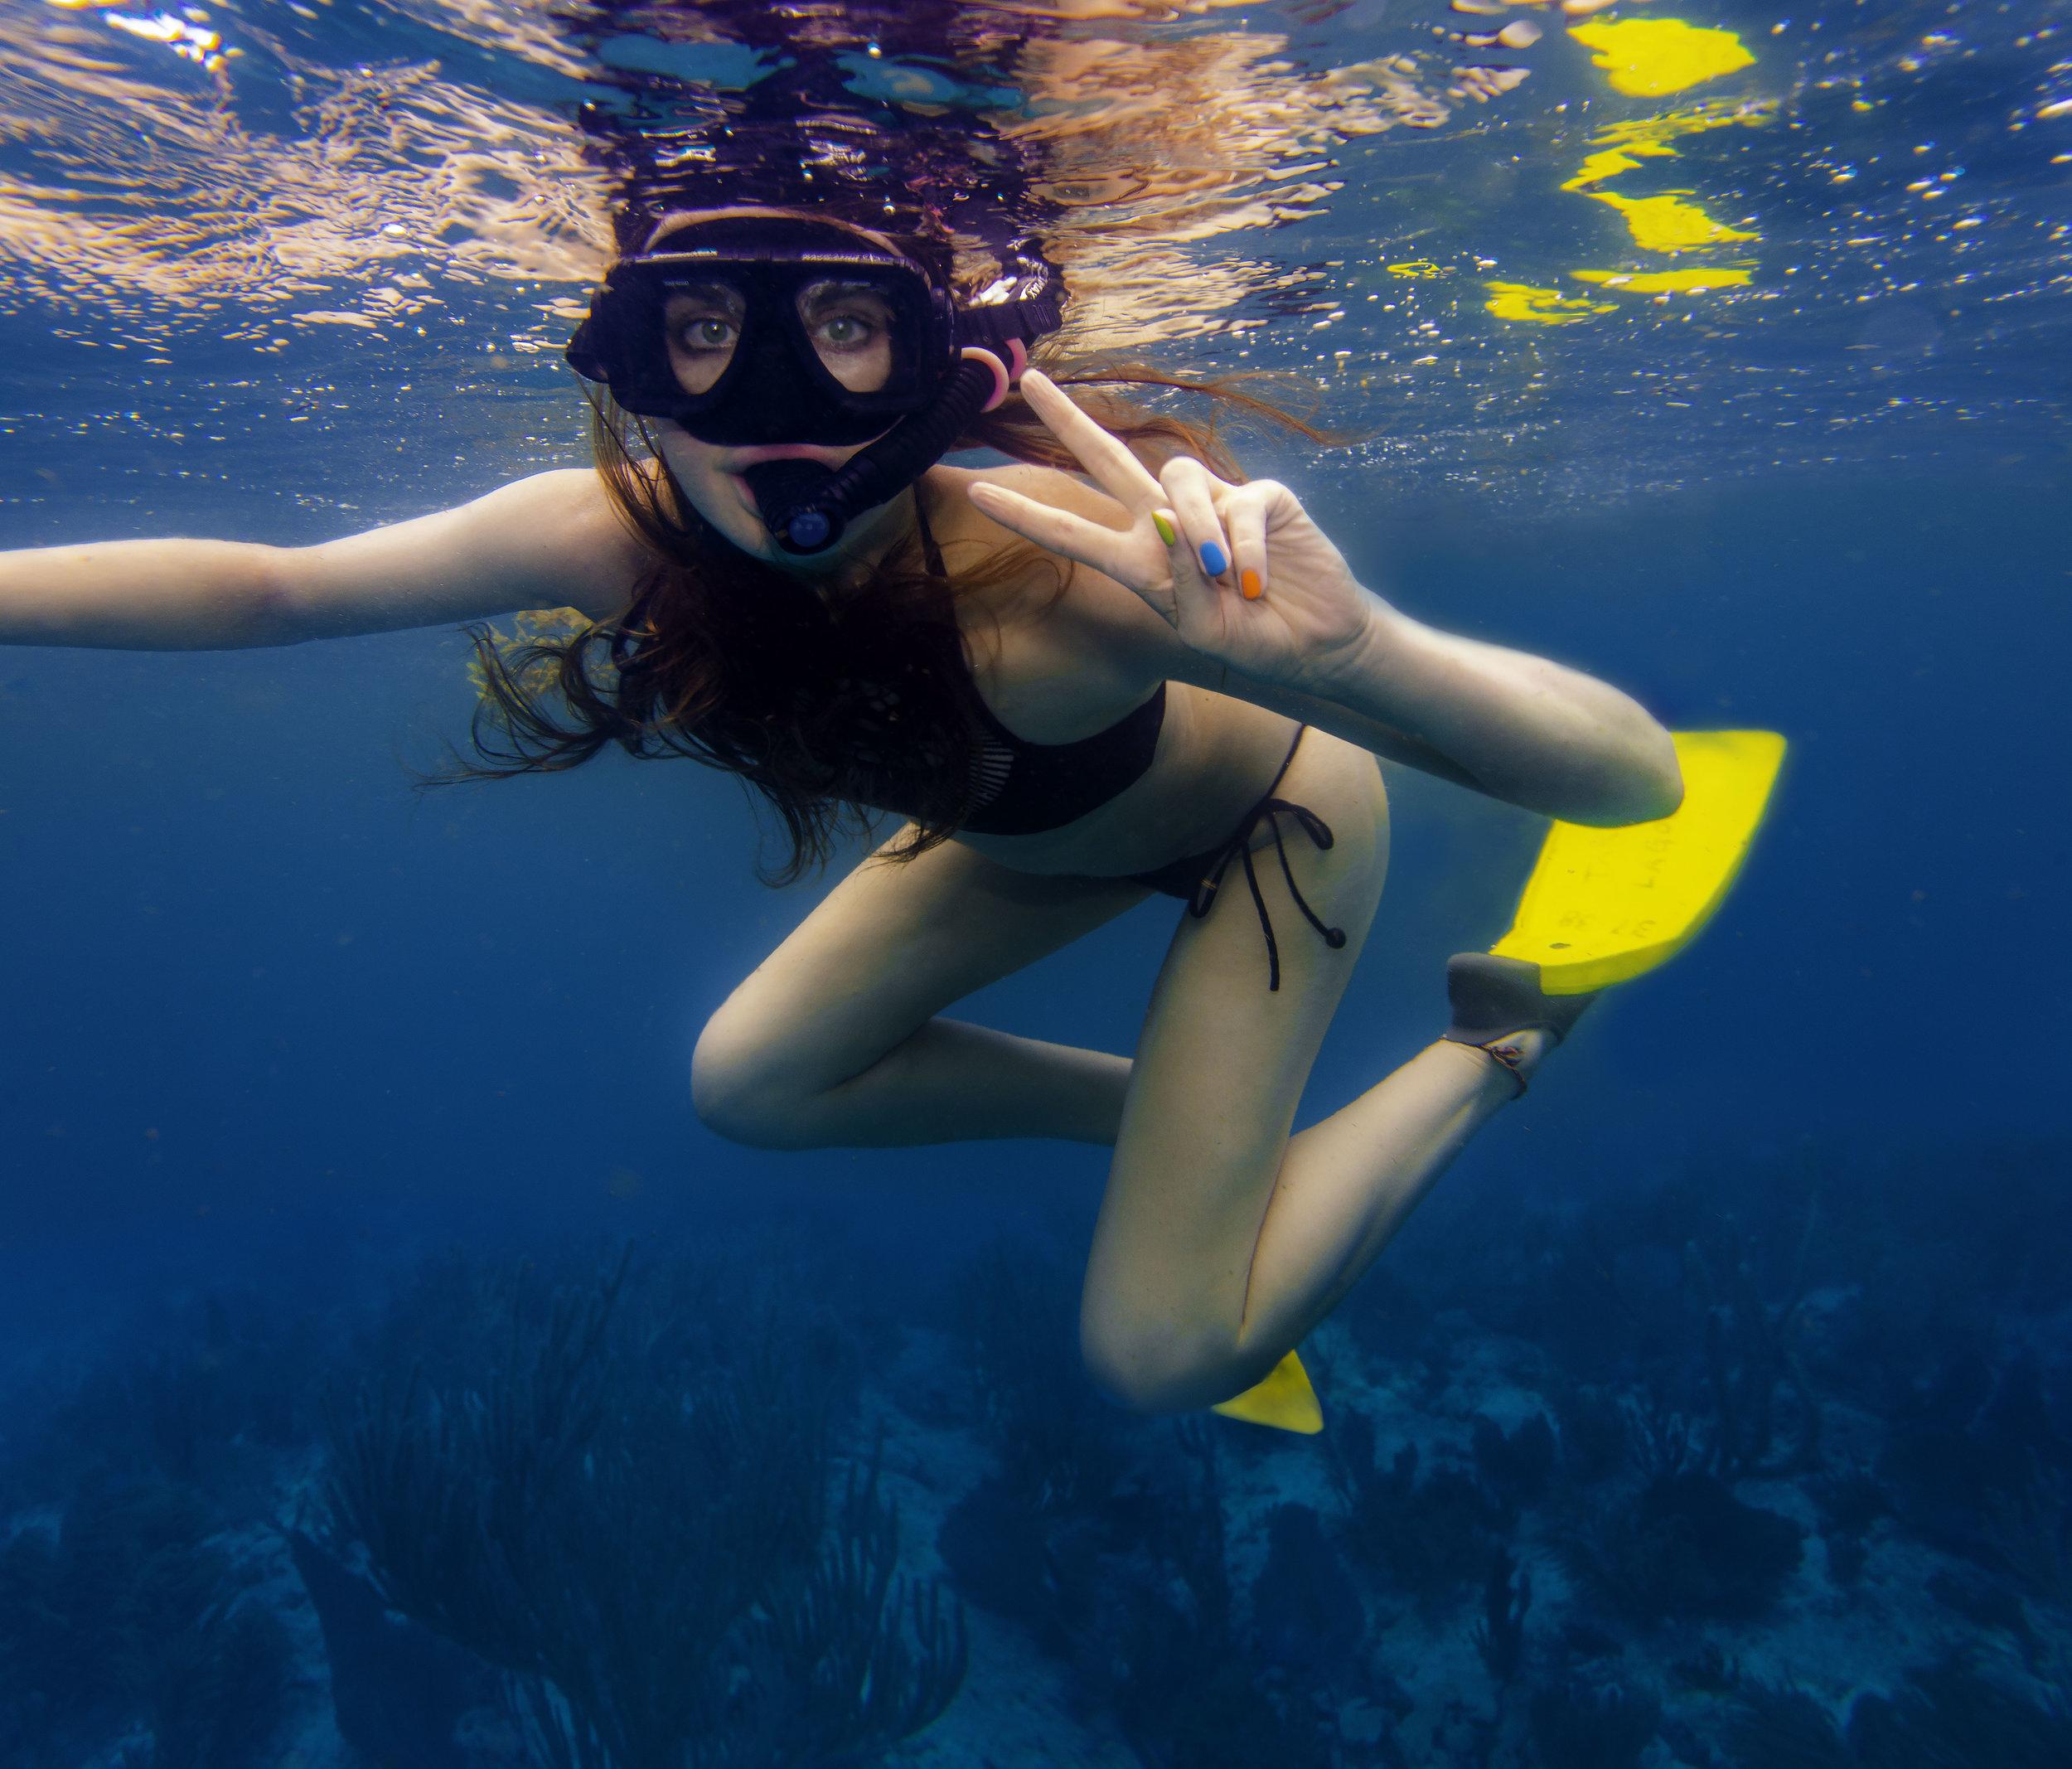 Anglers-Hotel-Reef-ve_steve-boxall-20180614_0580-Edit-2.jpg